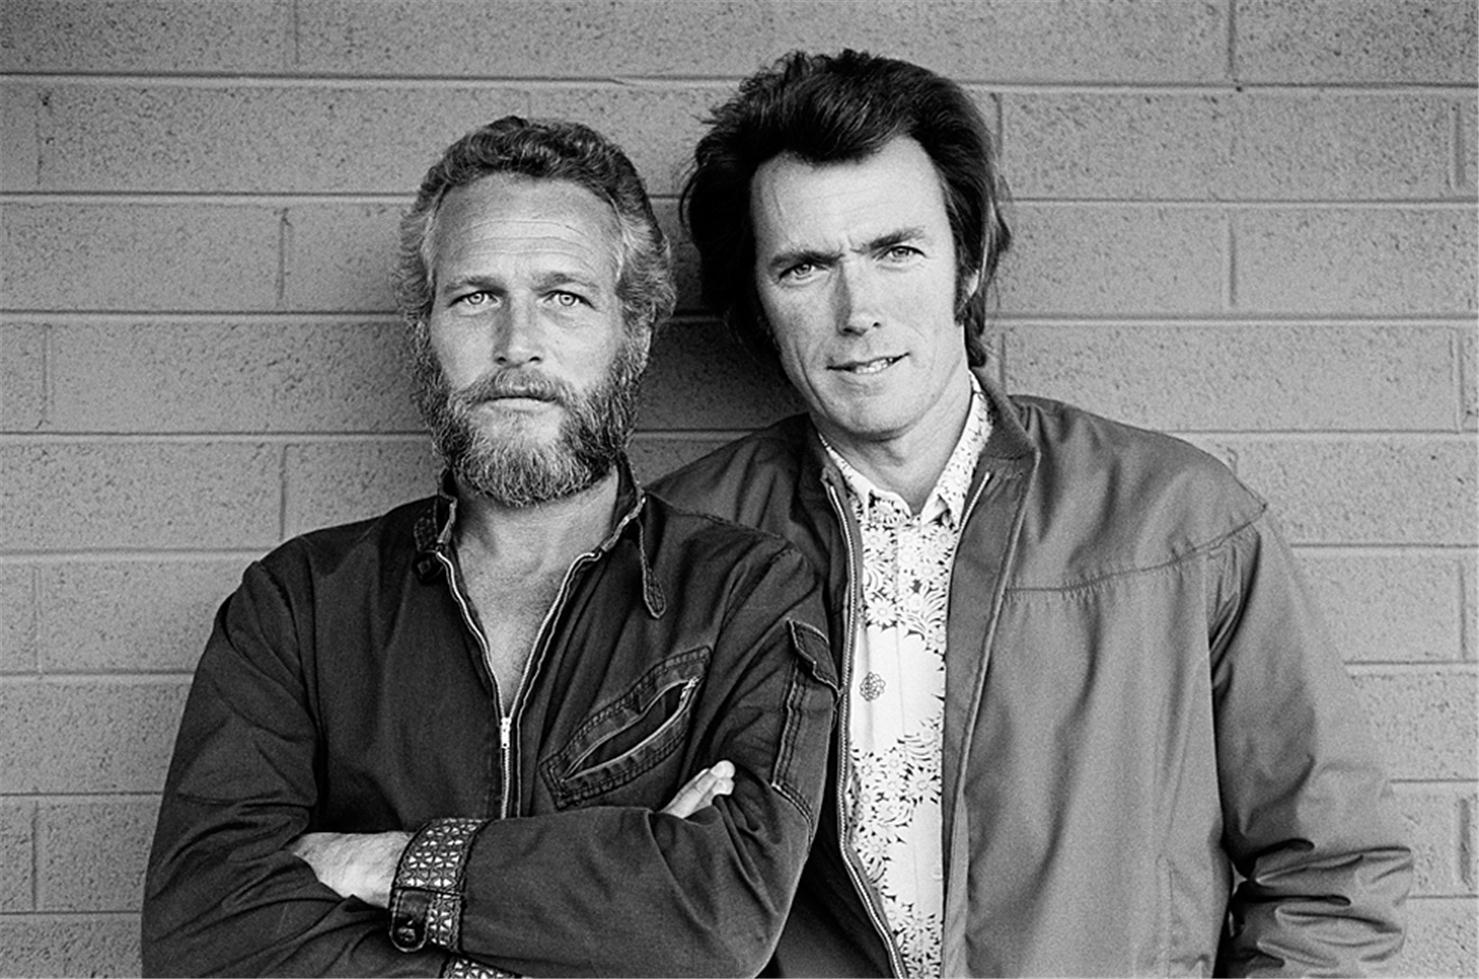 1972. Пол Ньюман и Клинт Иствуд